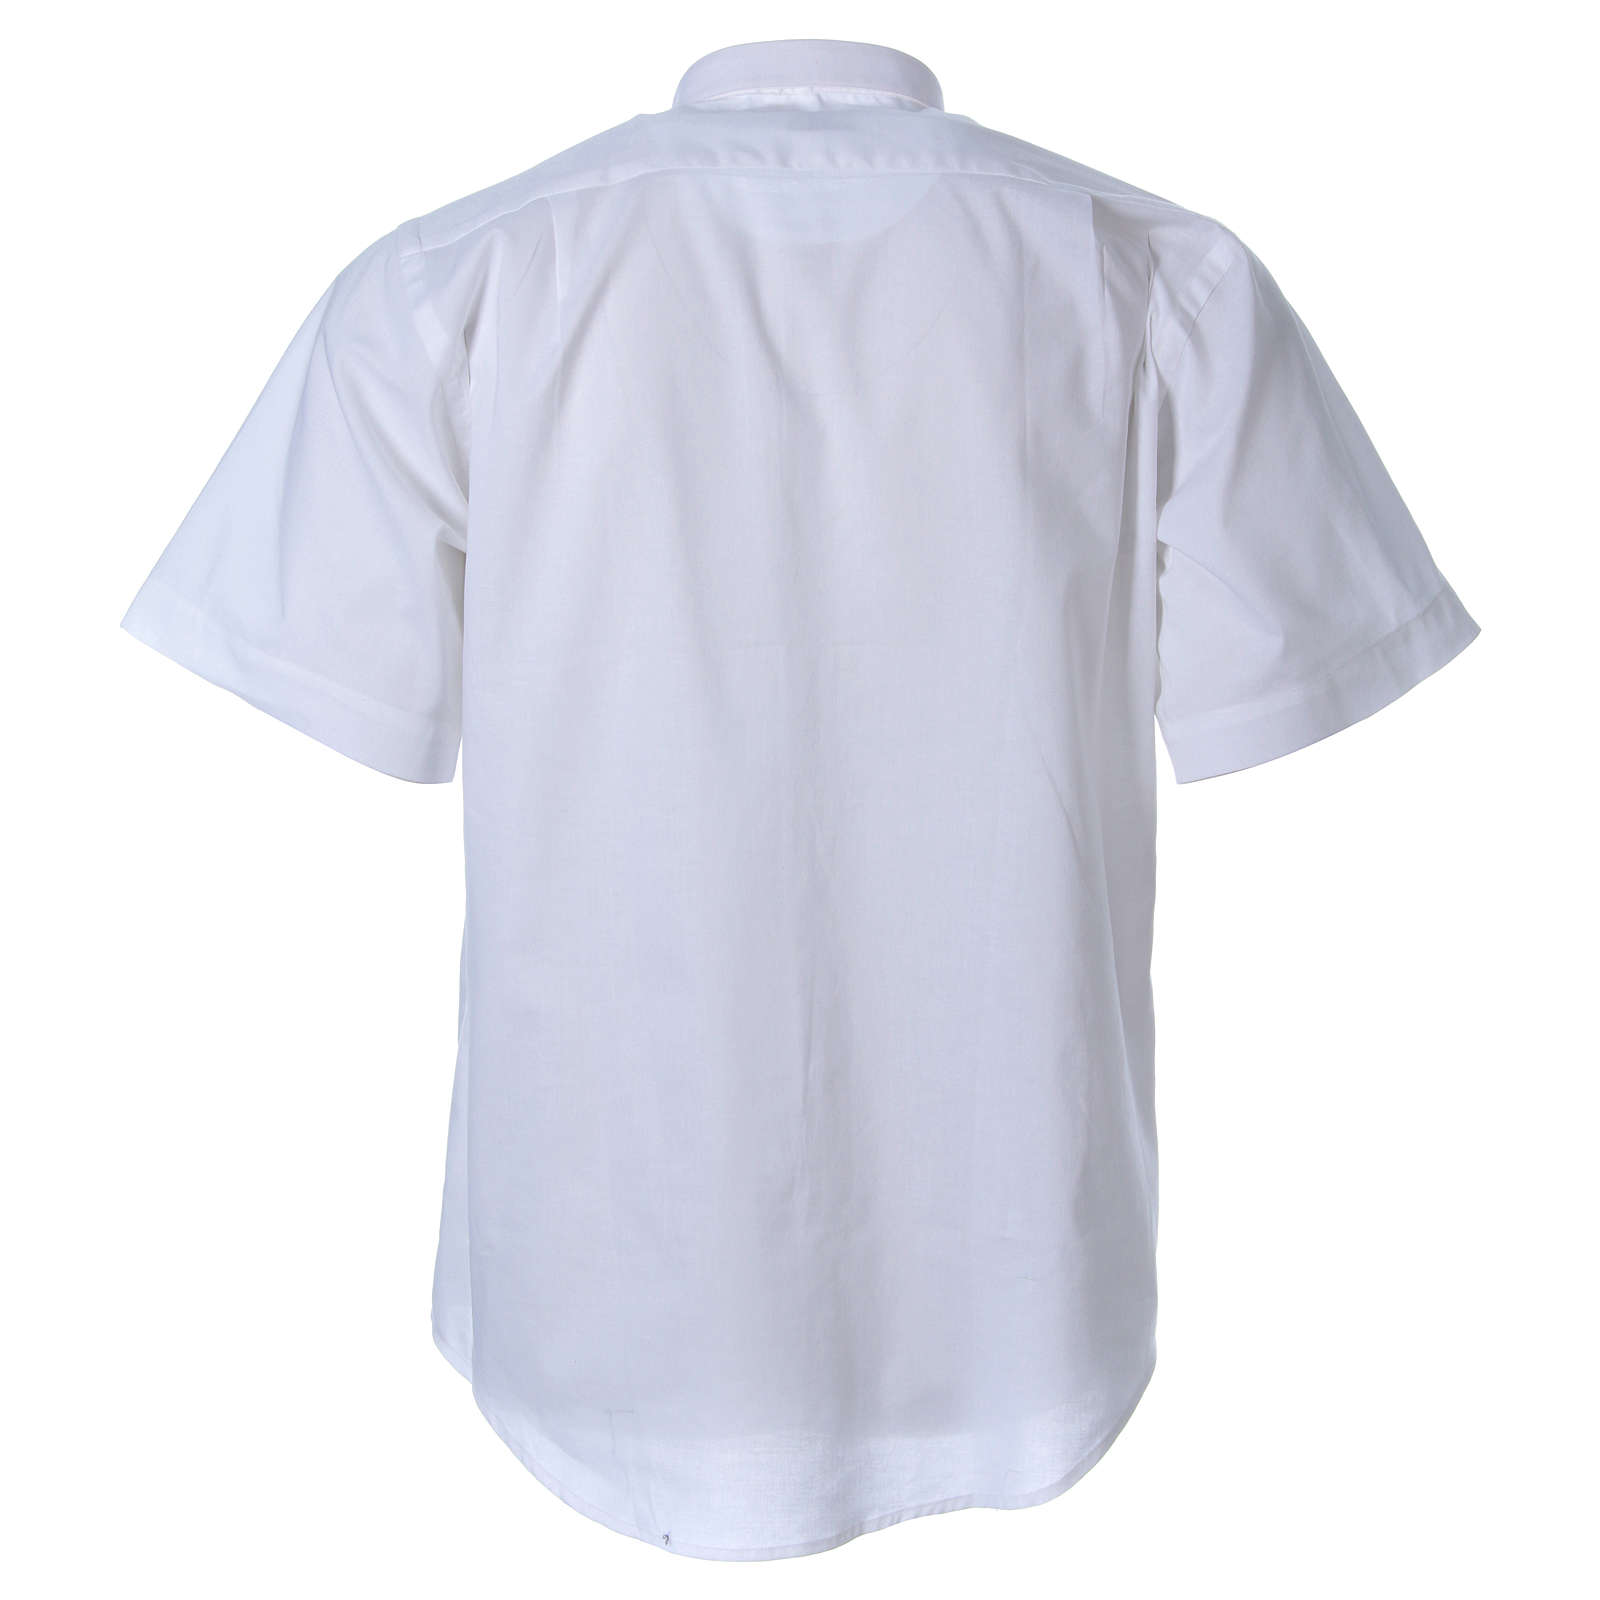 STOCK Chemise clergyman manches courtes mixte blanche 4